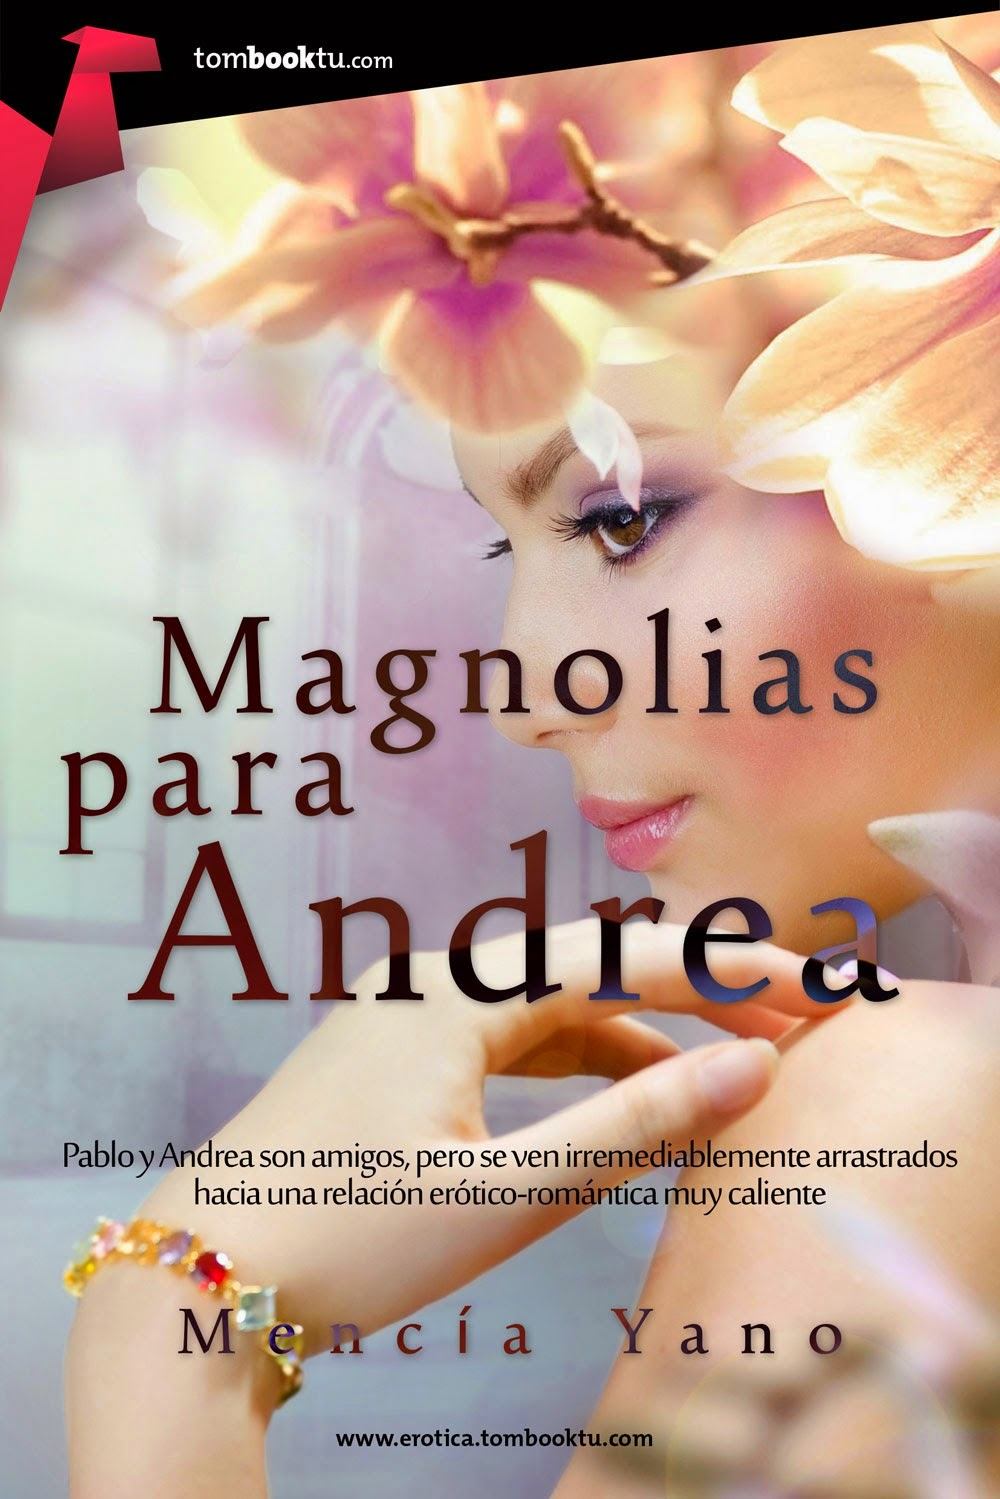 http://yerathelbooks.blogspot.com.es/2014/10/resena-libro-28-magnolias-para-andrea.html